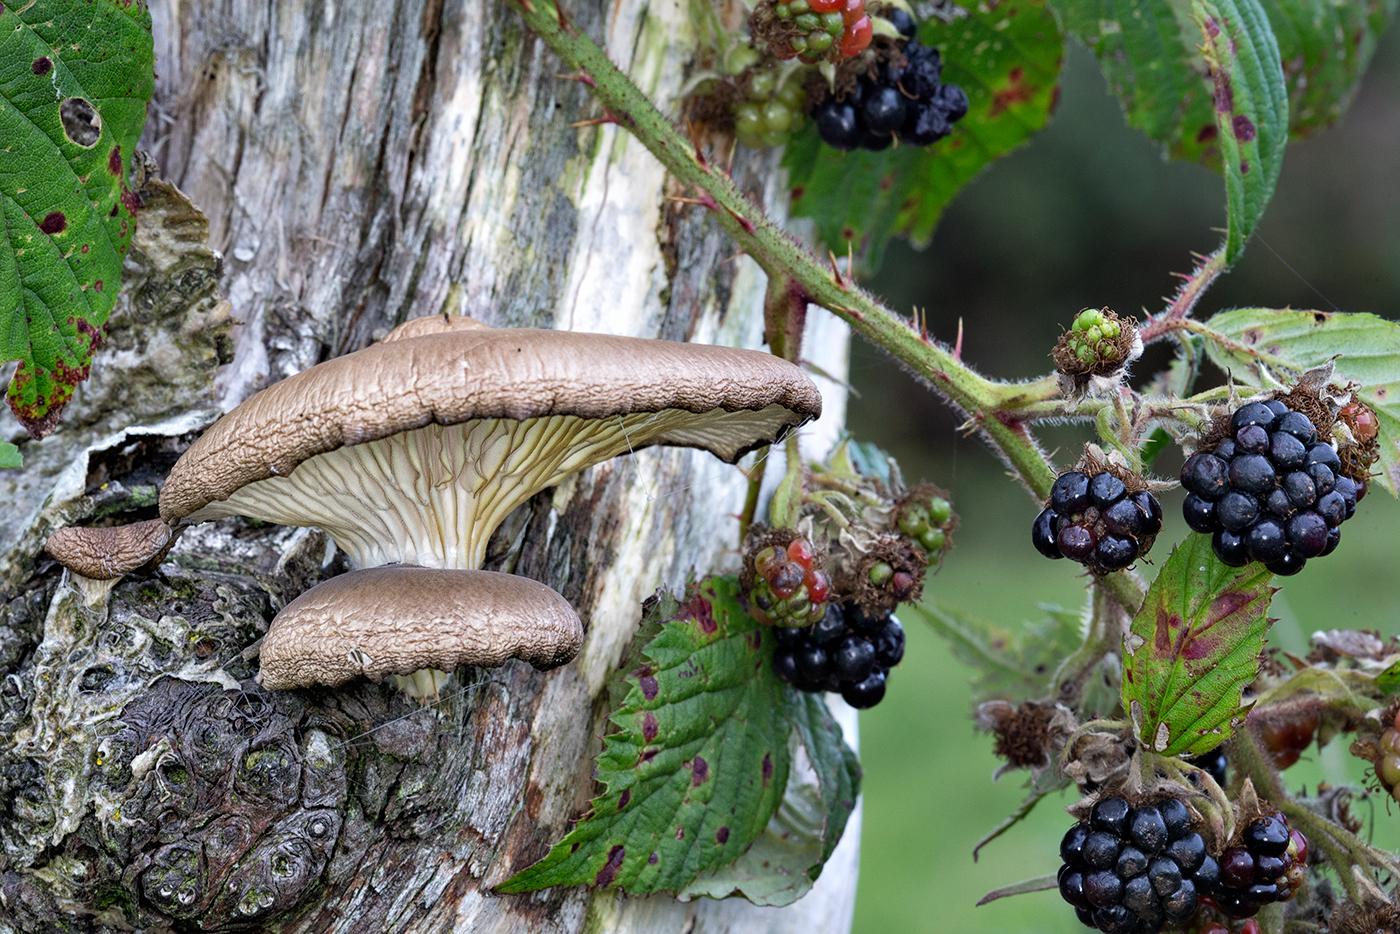 Fungi Pleurotus Ostreatus